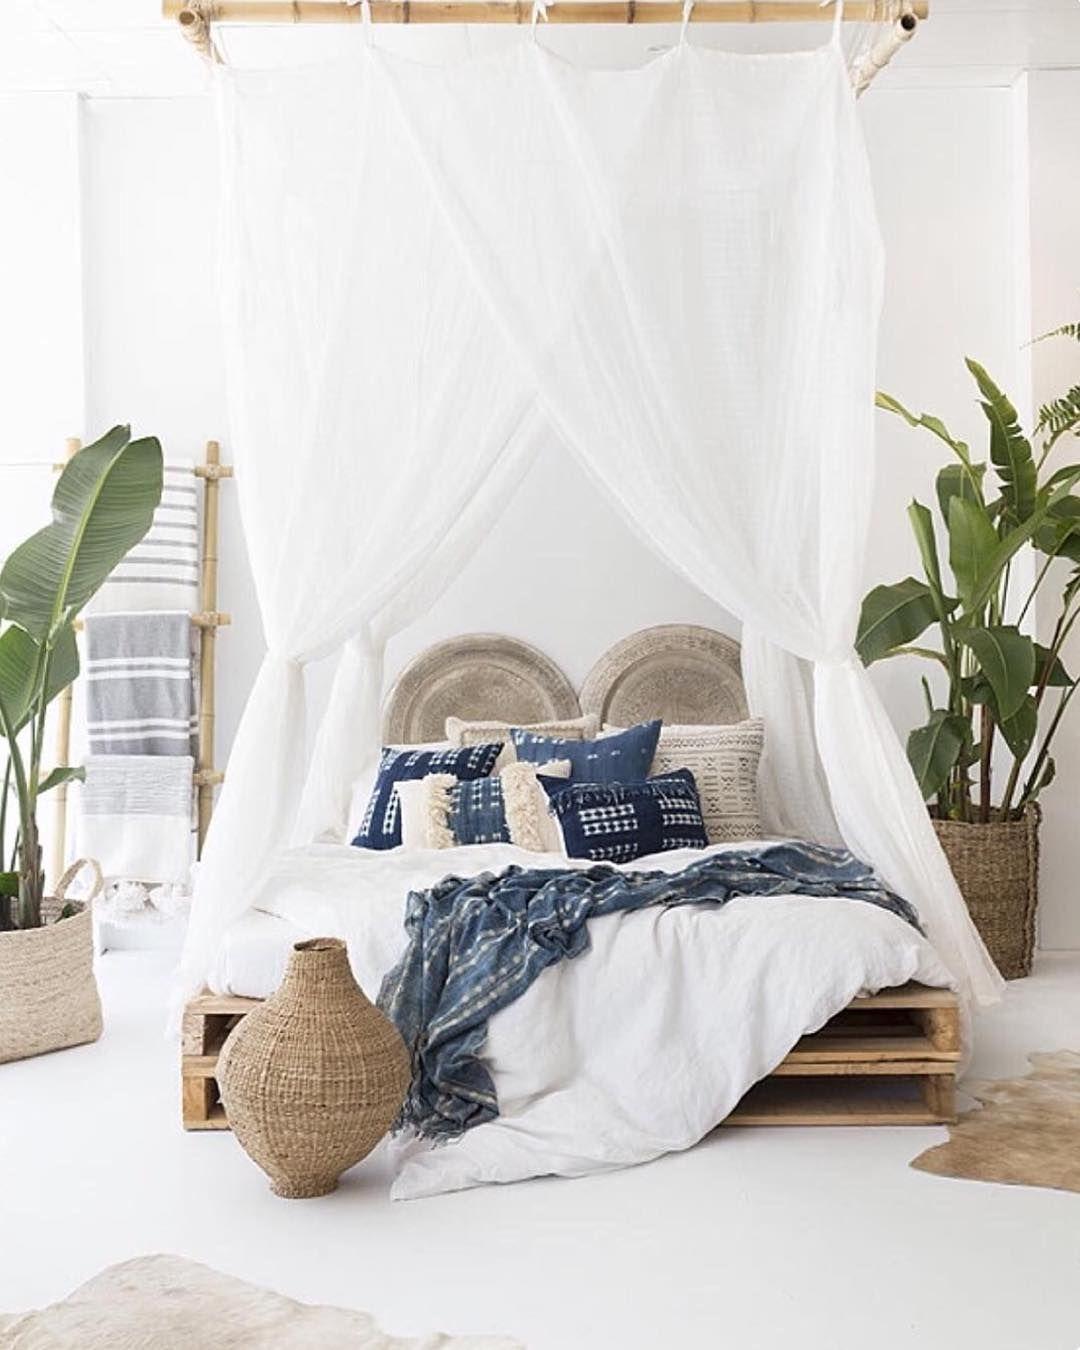 early dew flexa kast : Theartisanrevival Bangin Bedrooms Pinterest Bedrooms